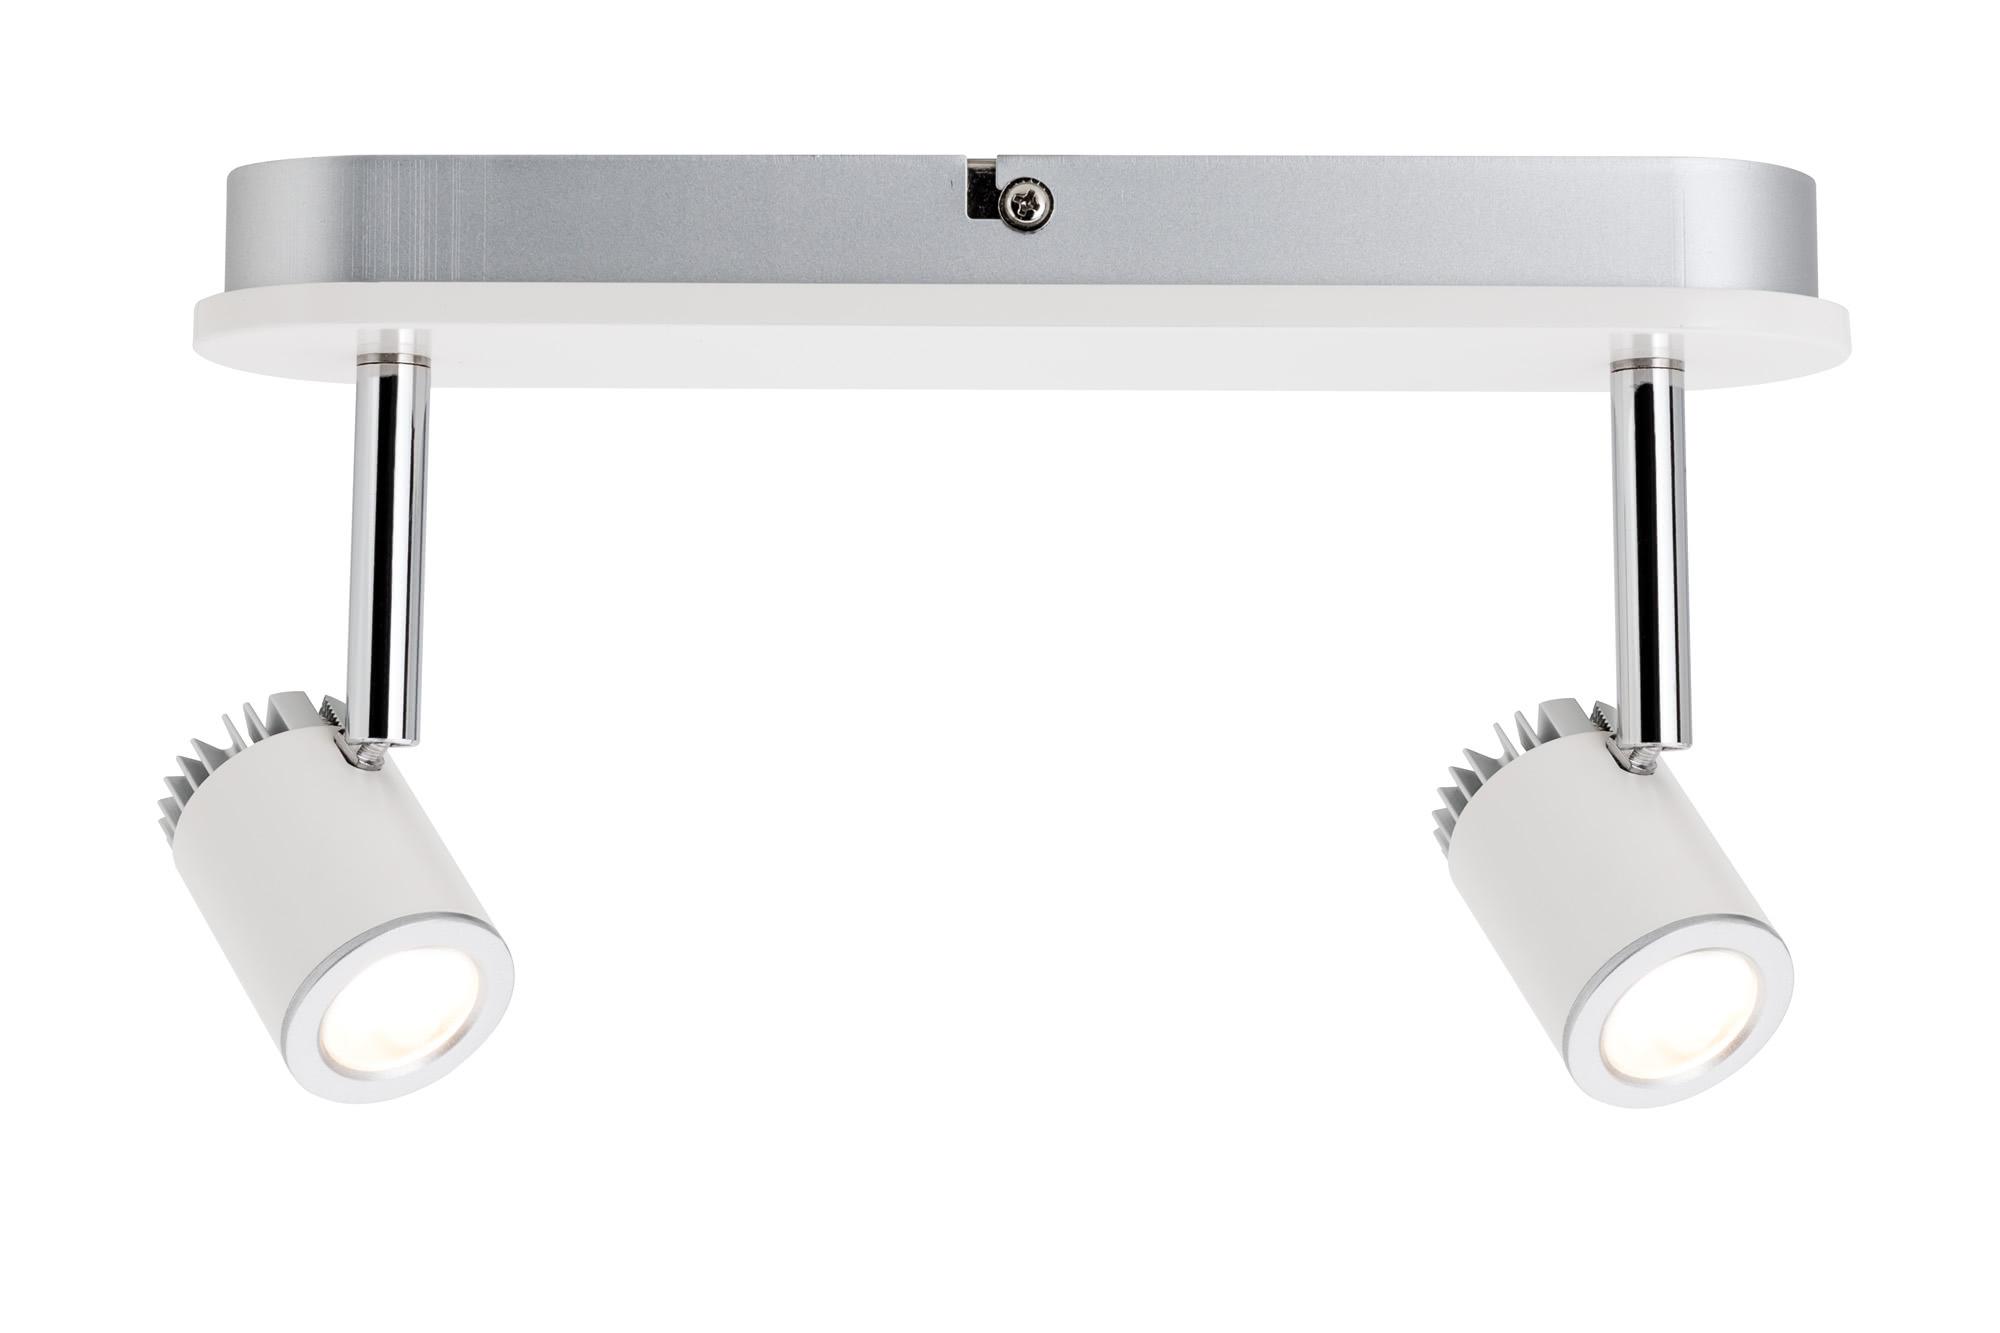 Paulmann. 60231 Светильник настенно-потолочный LED Balken 2x3W Ws-m